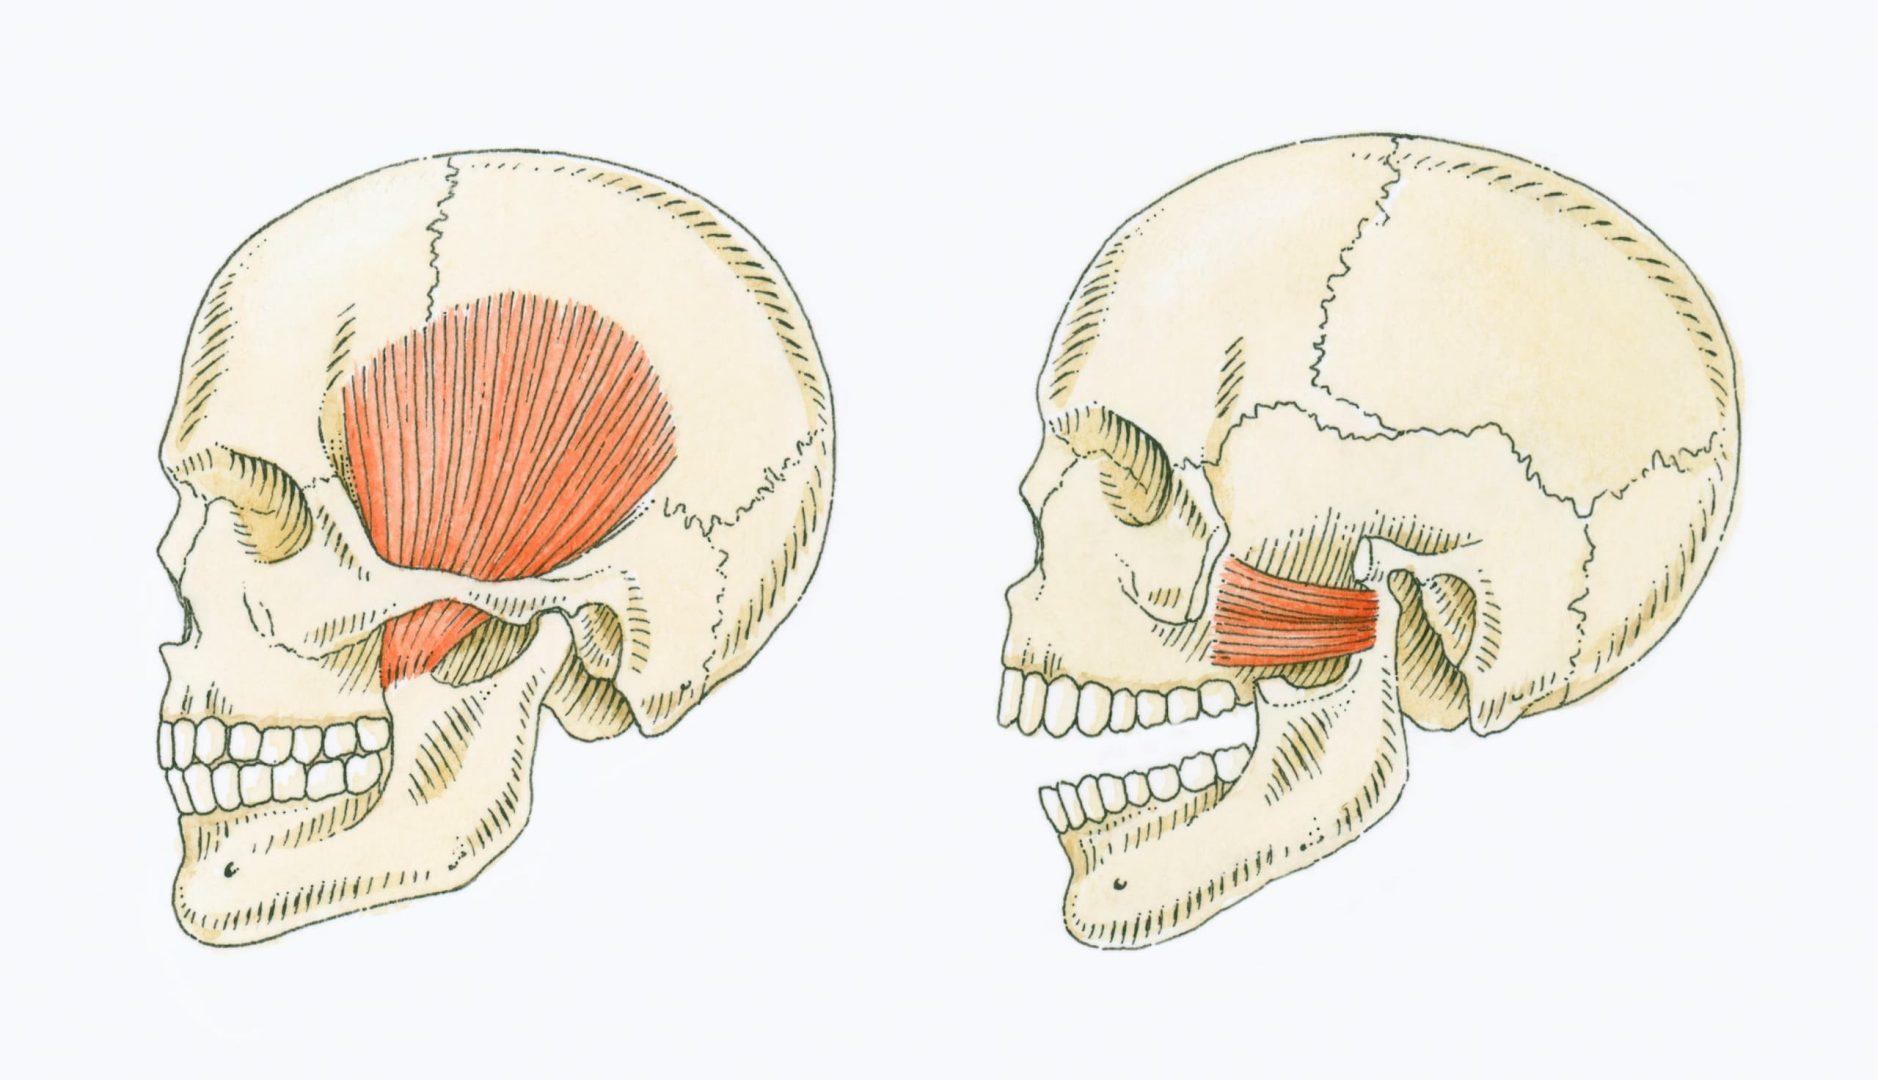 Schéma articulation temporo-mandibulaire